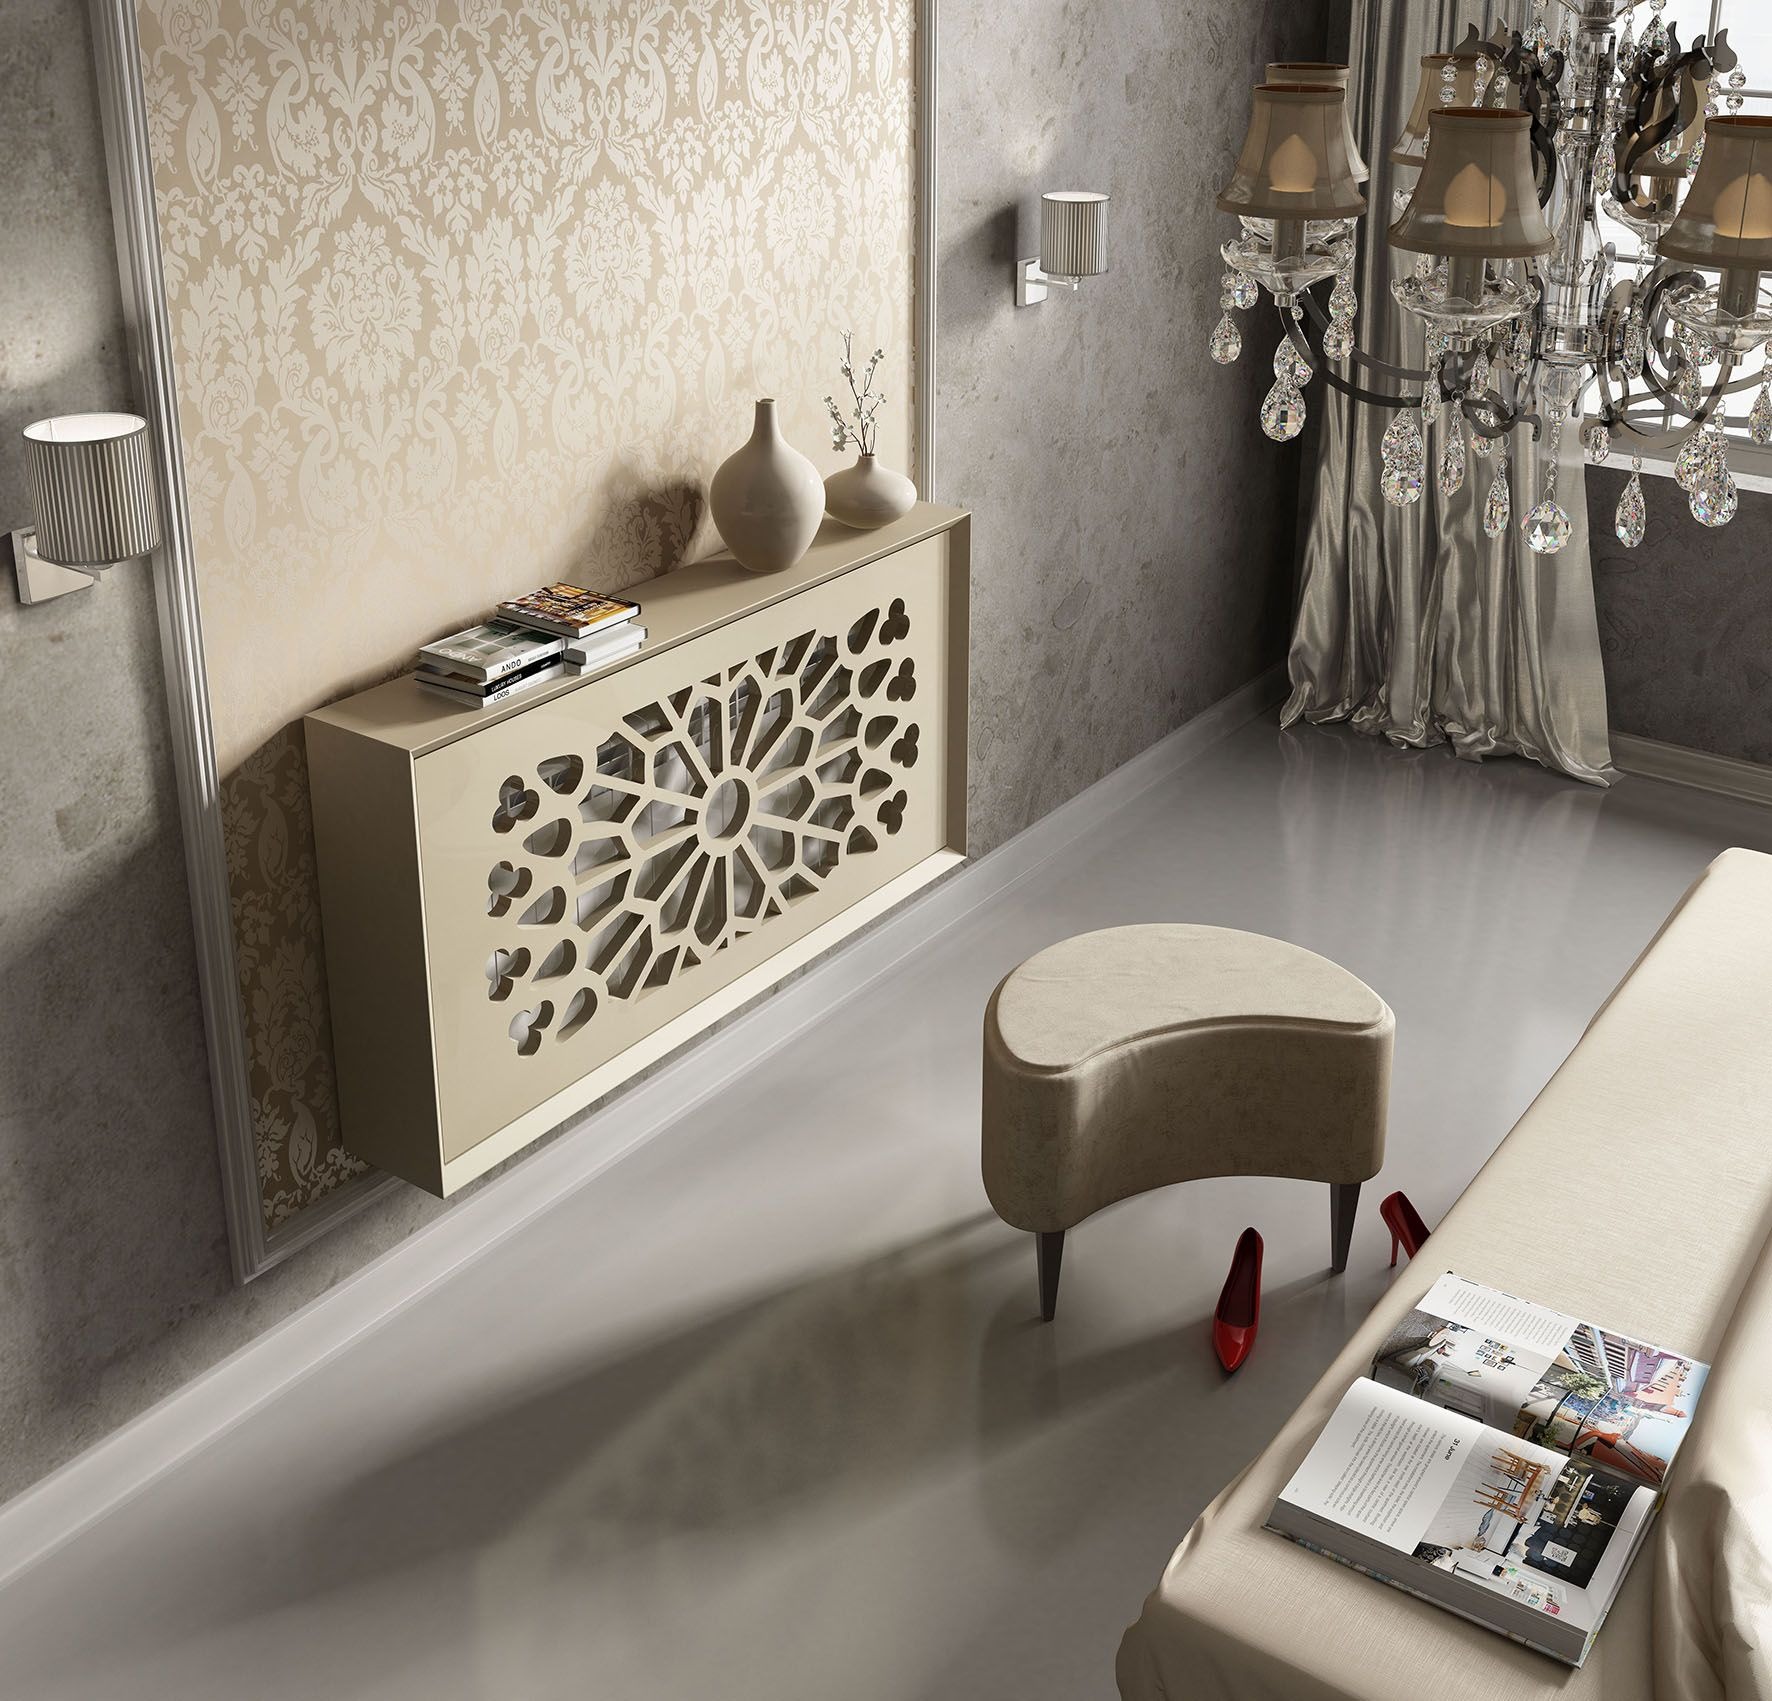 Modelos De Muebles De Salon Finest Muebles Muoz Modelo Cdigo  # Muebles Gismobel